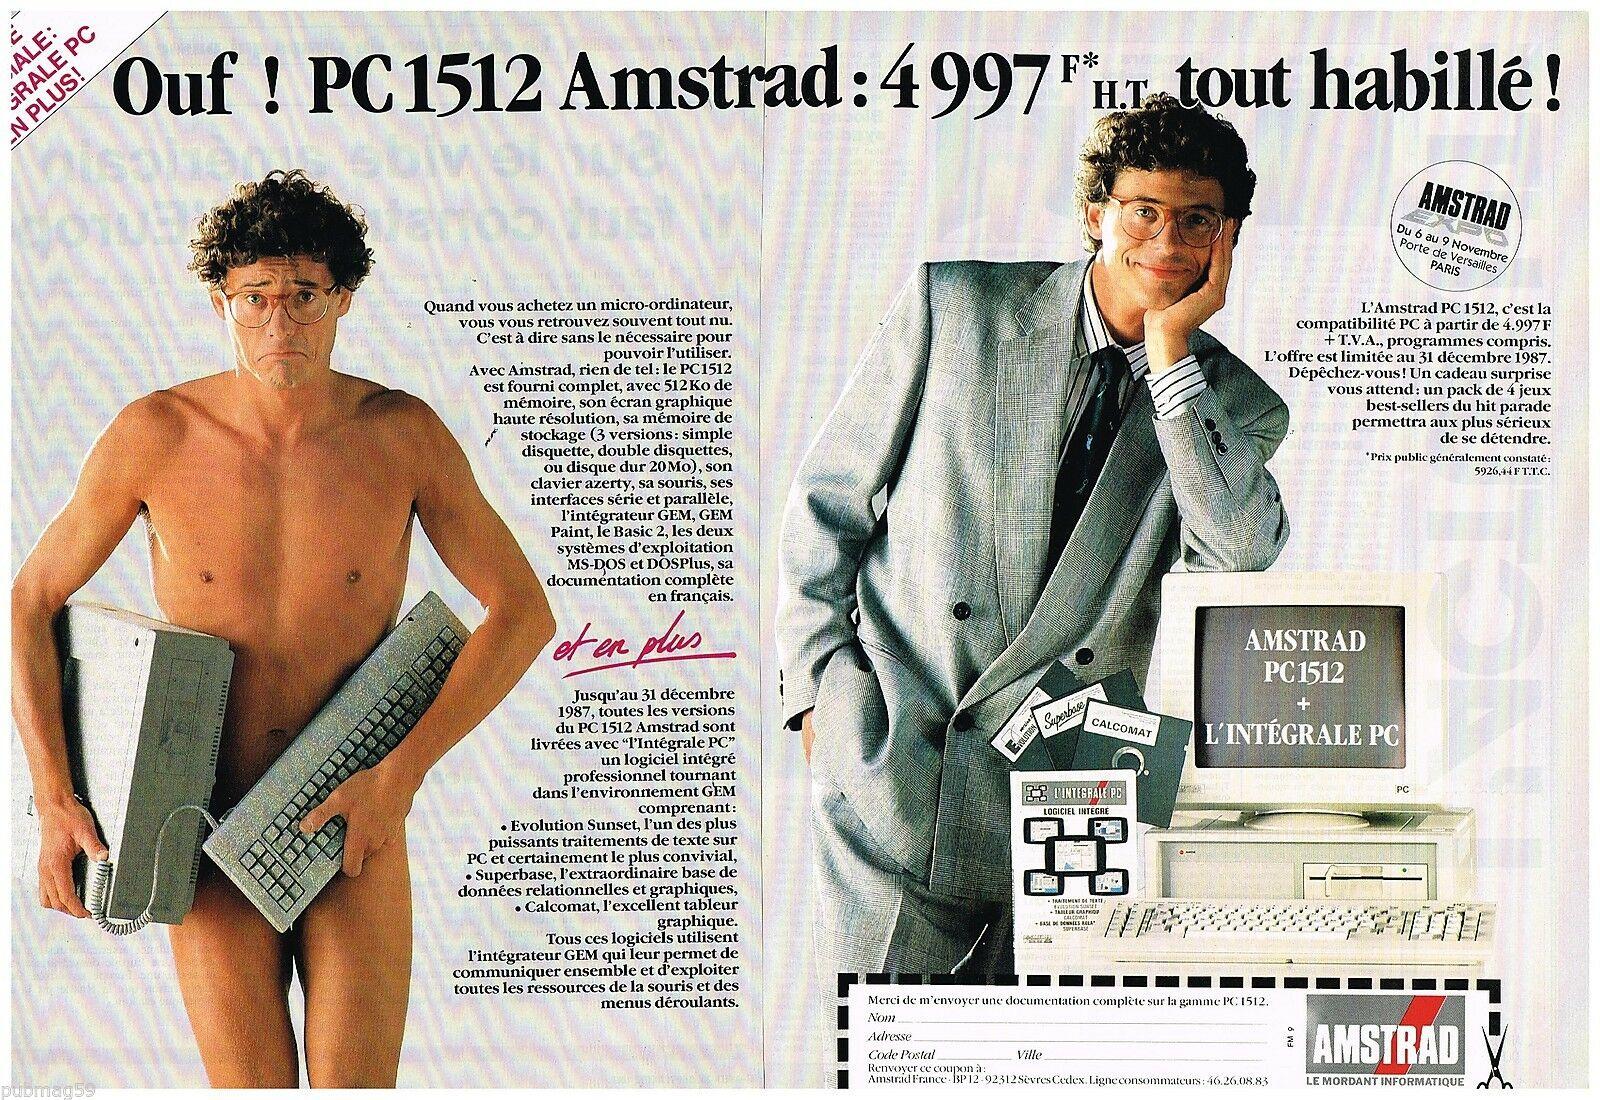 1987 Ordinateur PC 1512 Amstrad